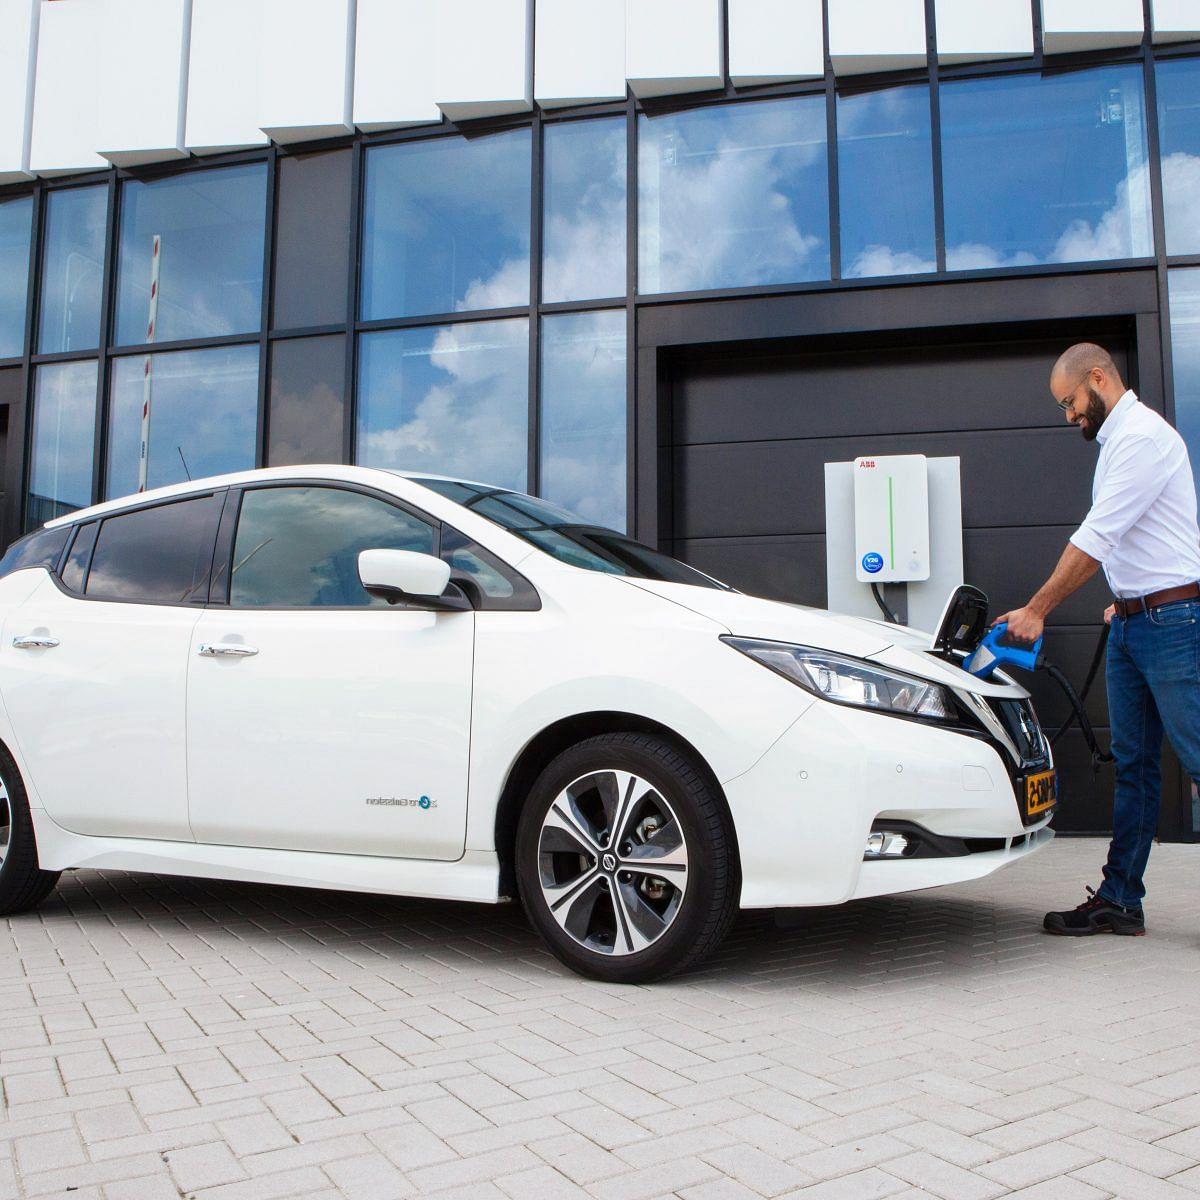 EDF & Nissan Launch Commercial V2G Service for EV fleets